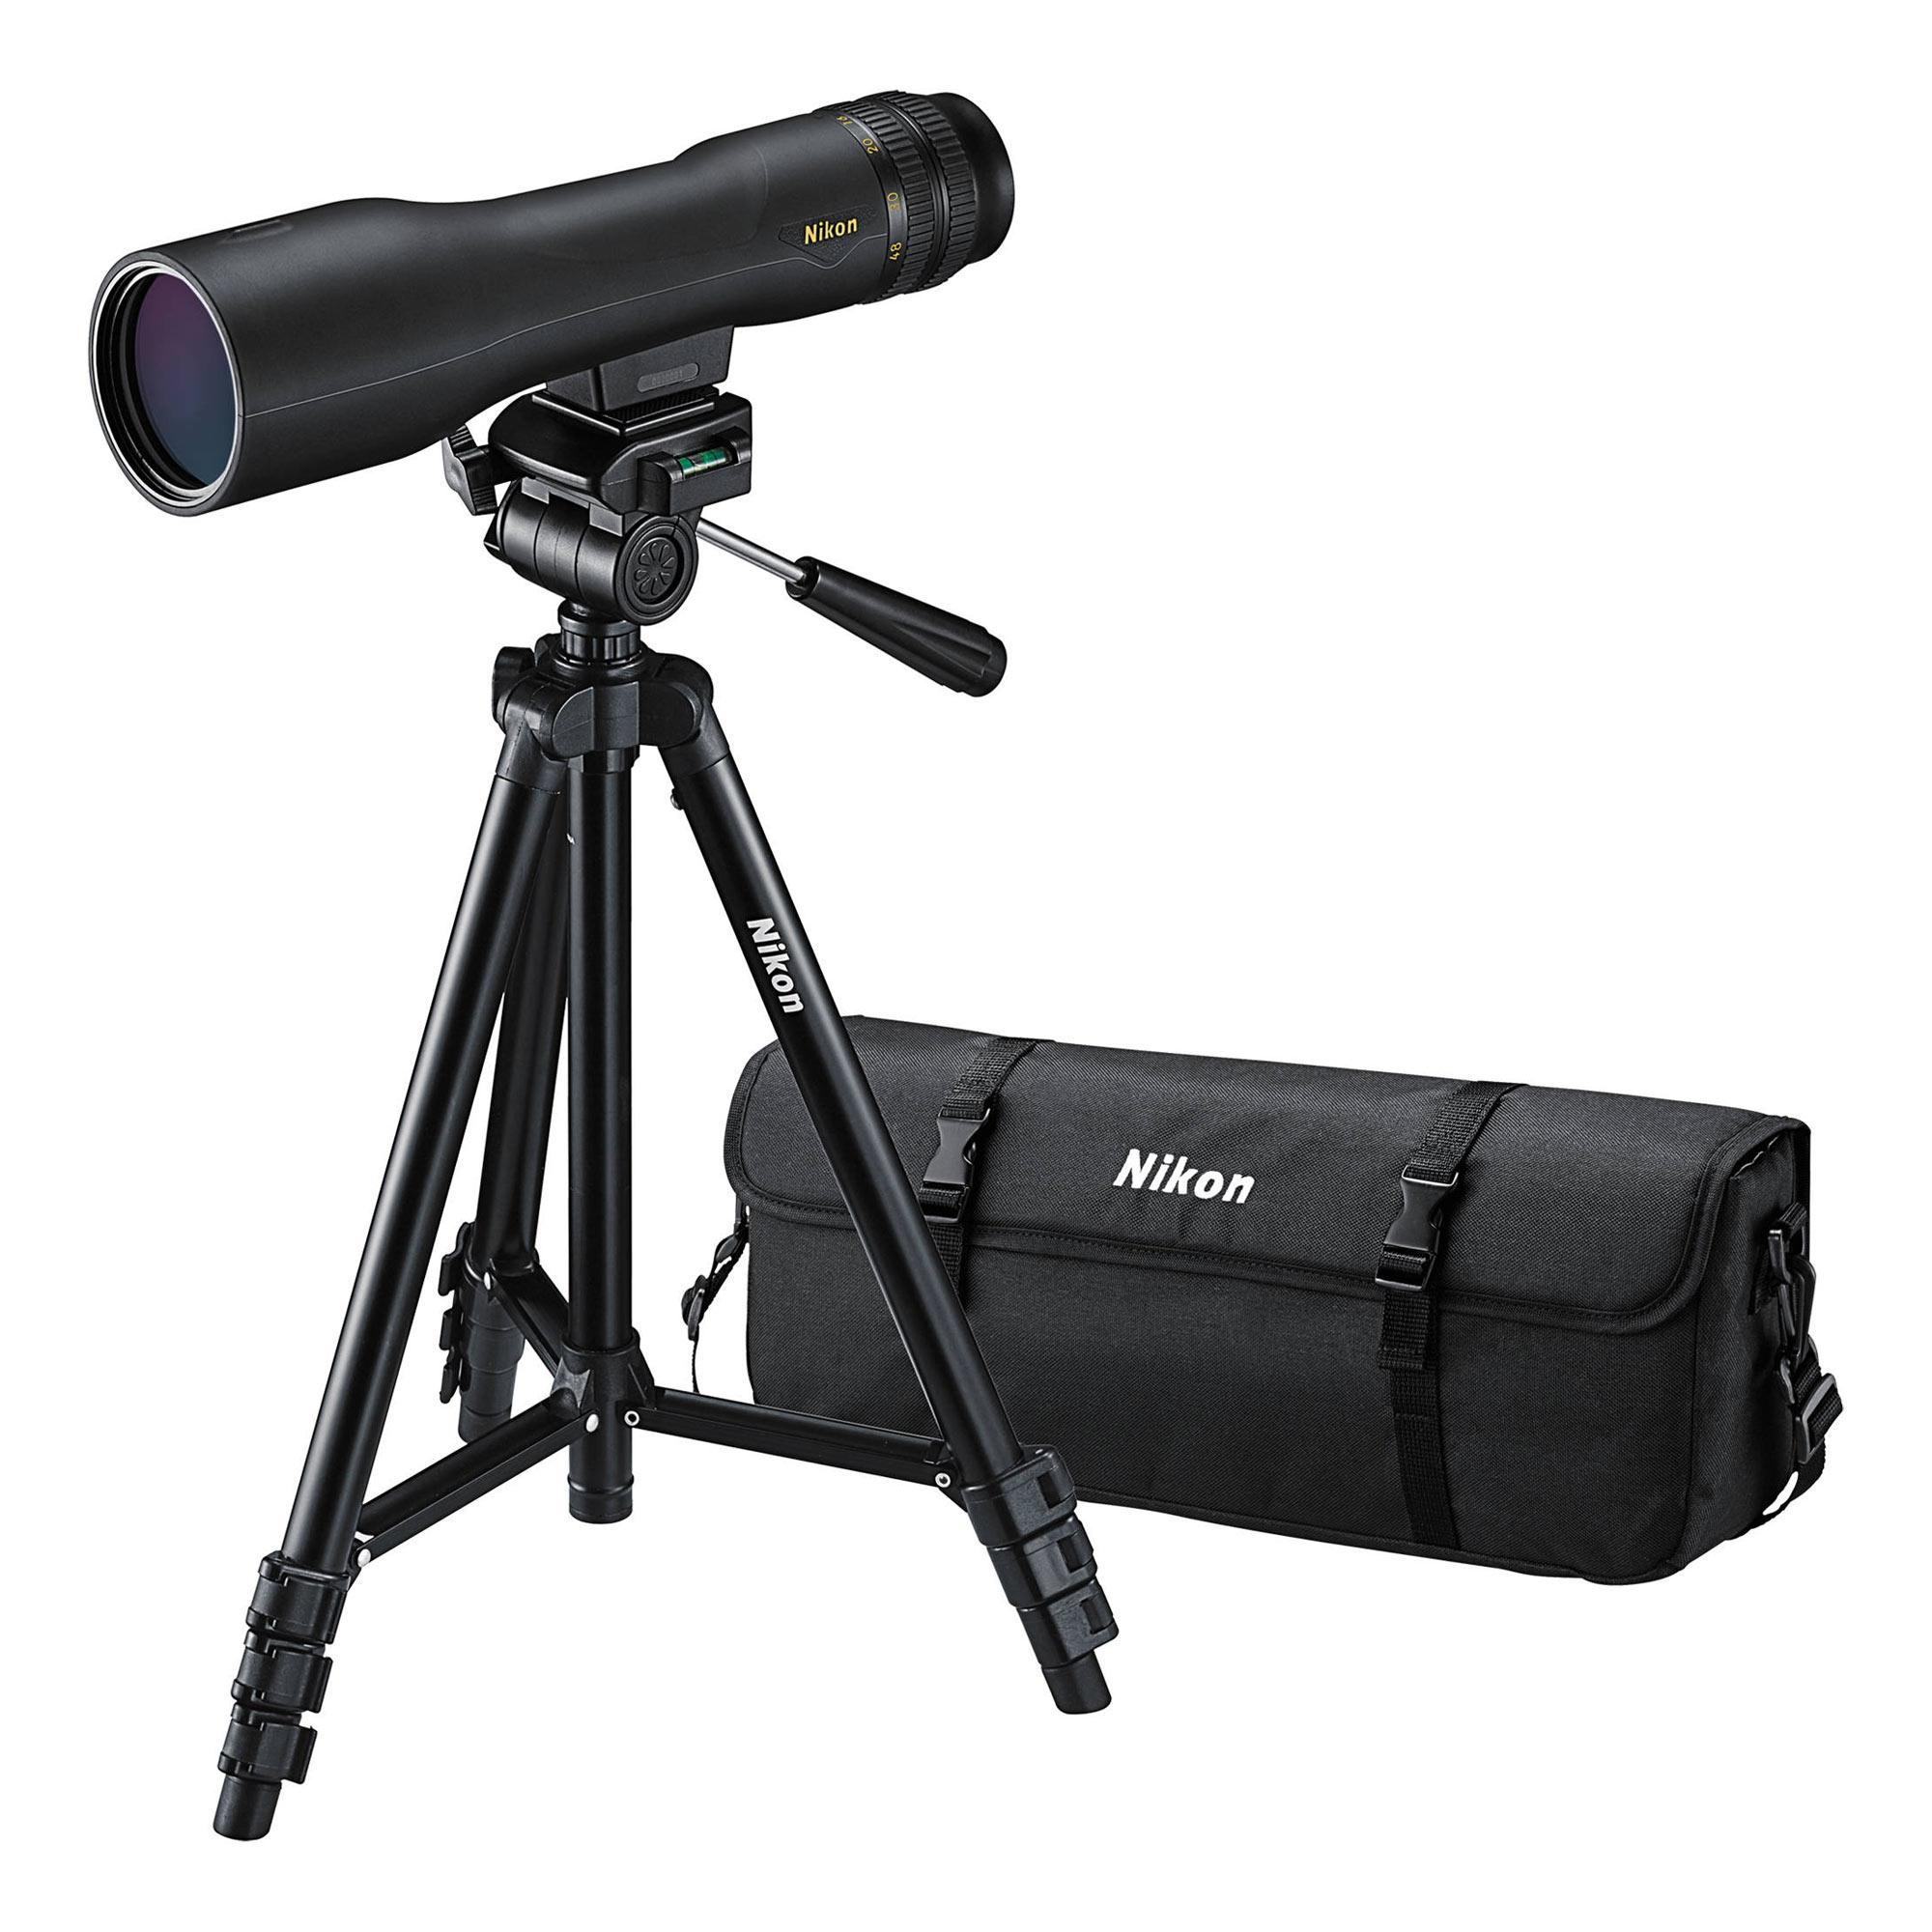 Prostaff 3 16-48x60 Spotting Scope Kit Straight Viewing